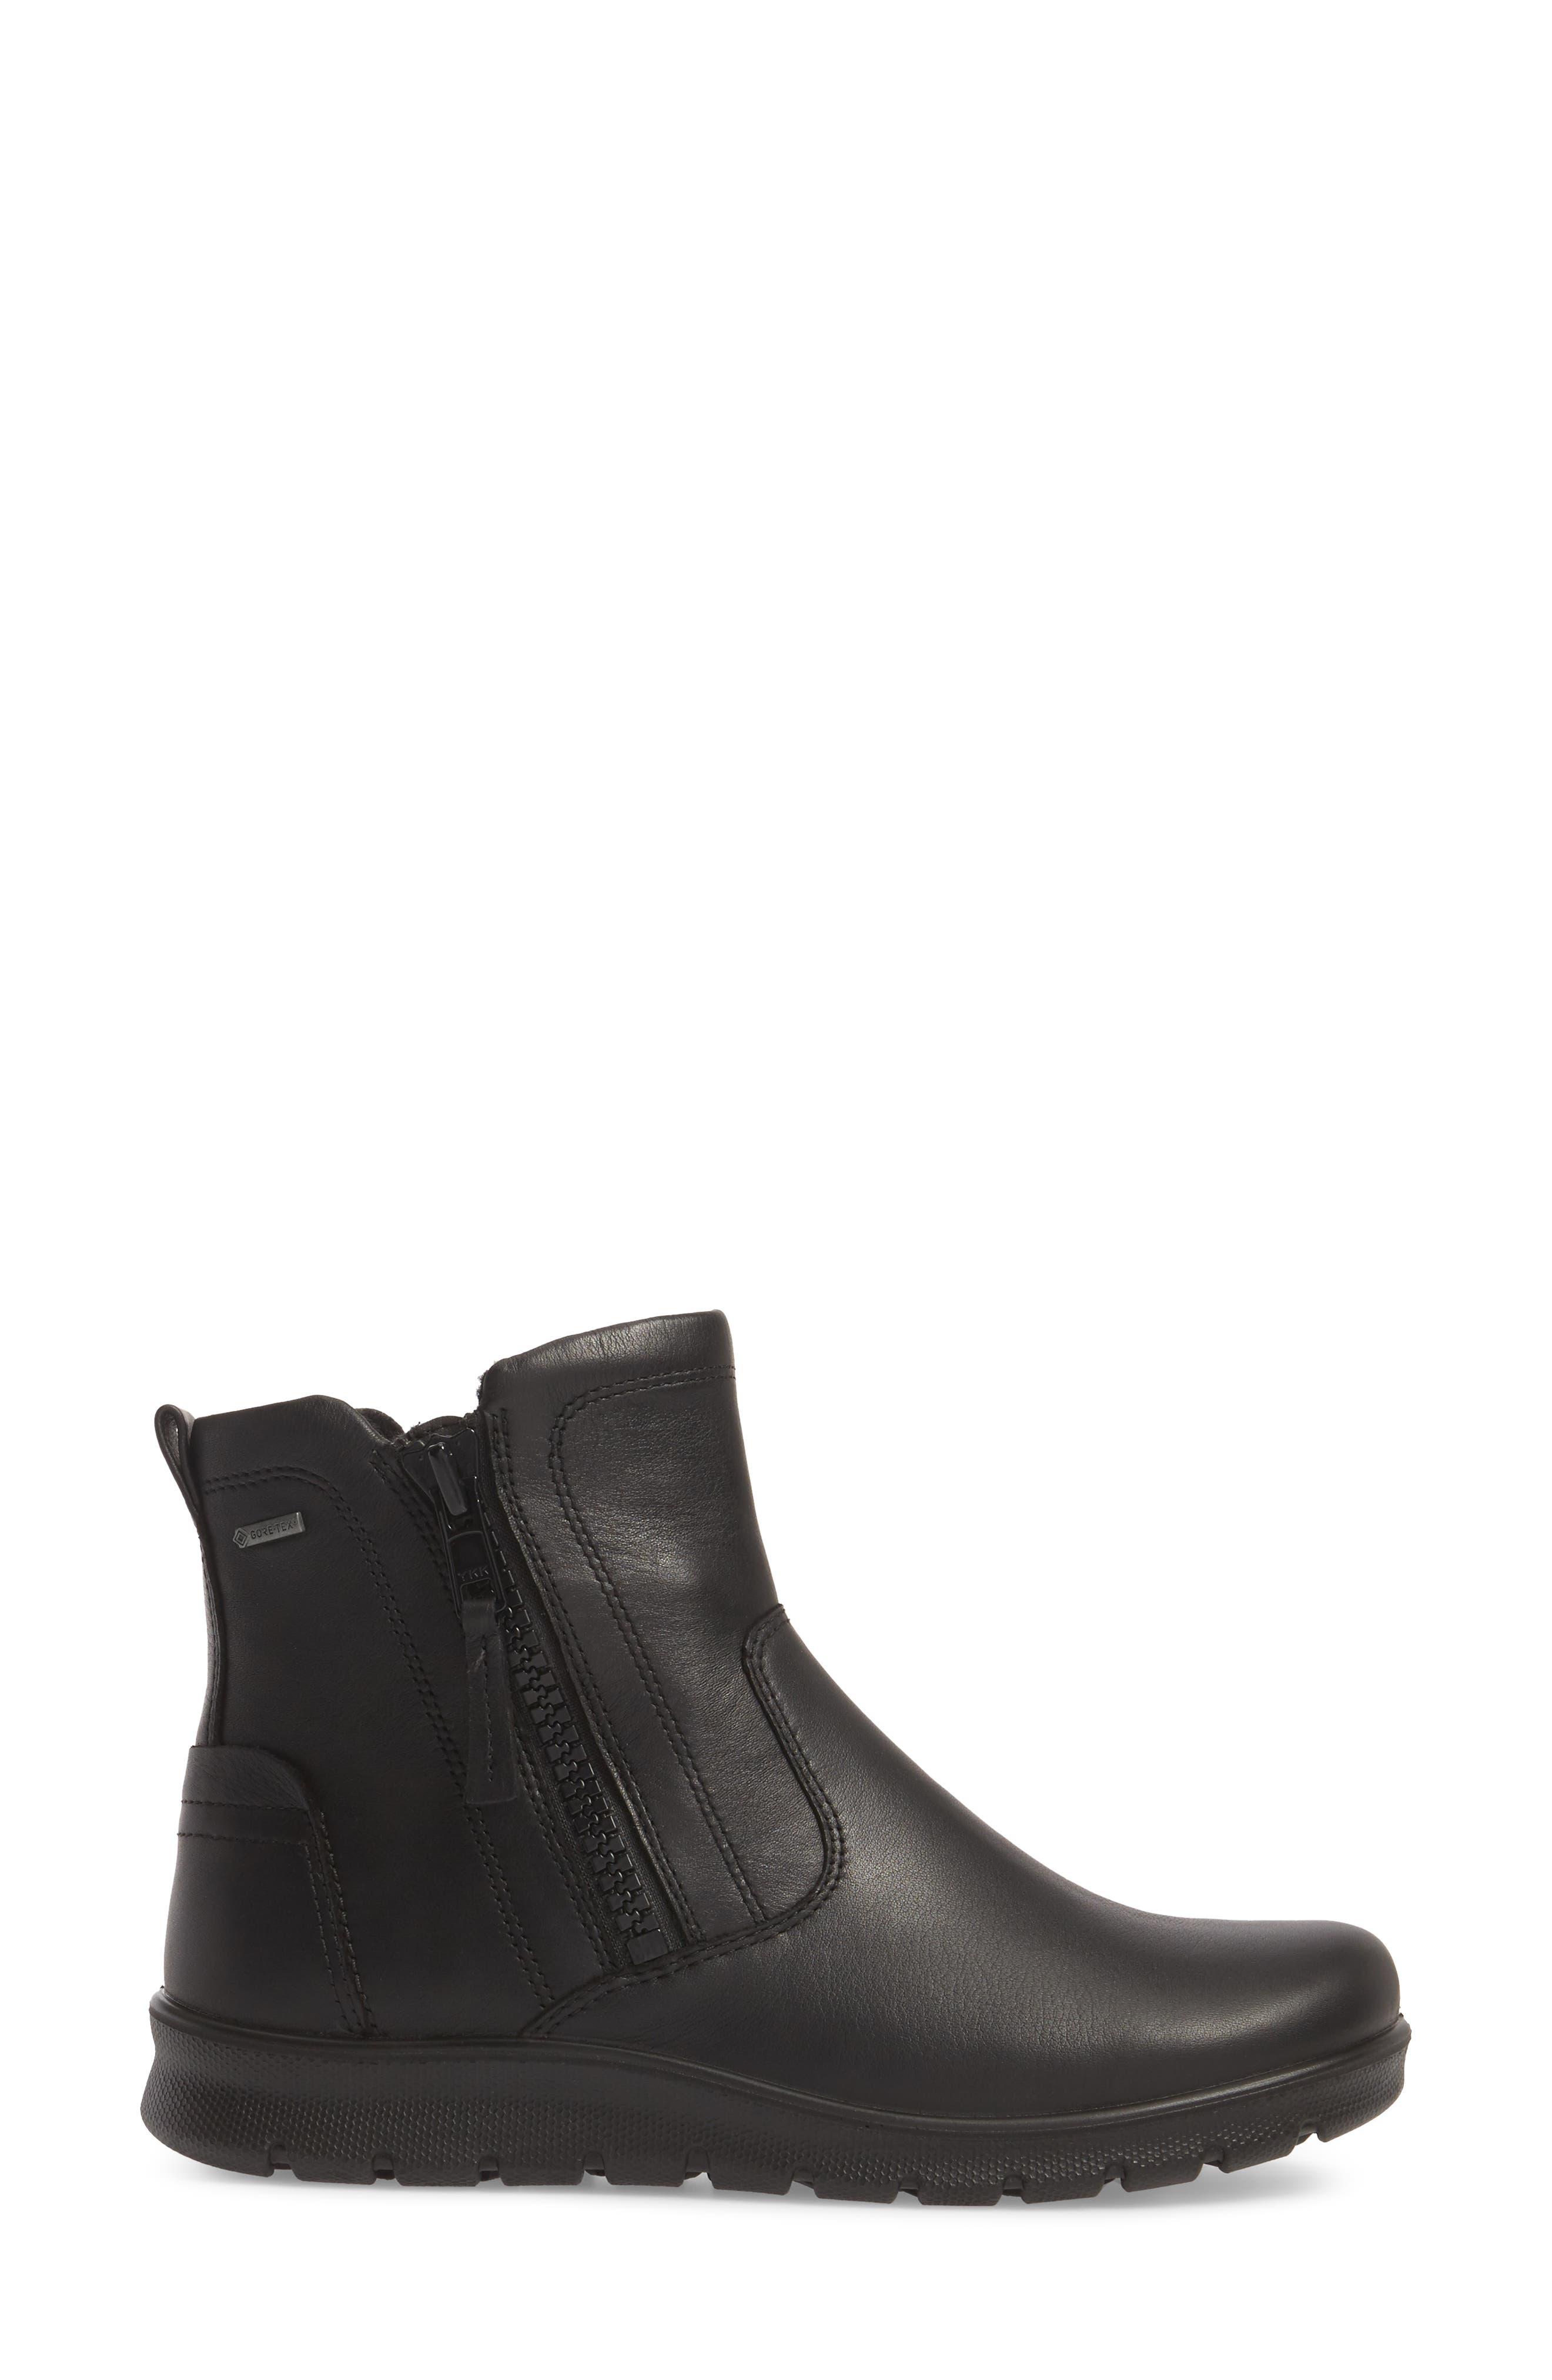 Babett Gore-Tex<sup>®</sup> Bootie,                             Alternate thumbnail 3, color,                             Black Leather